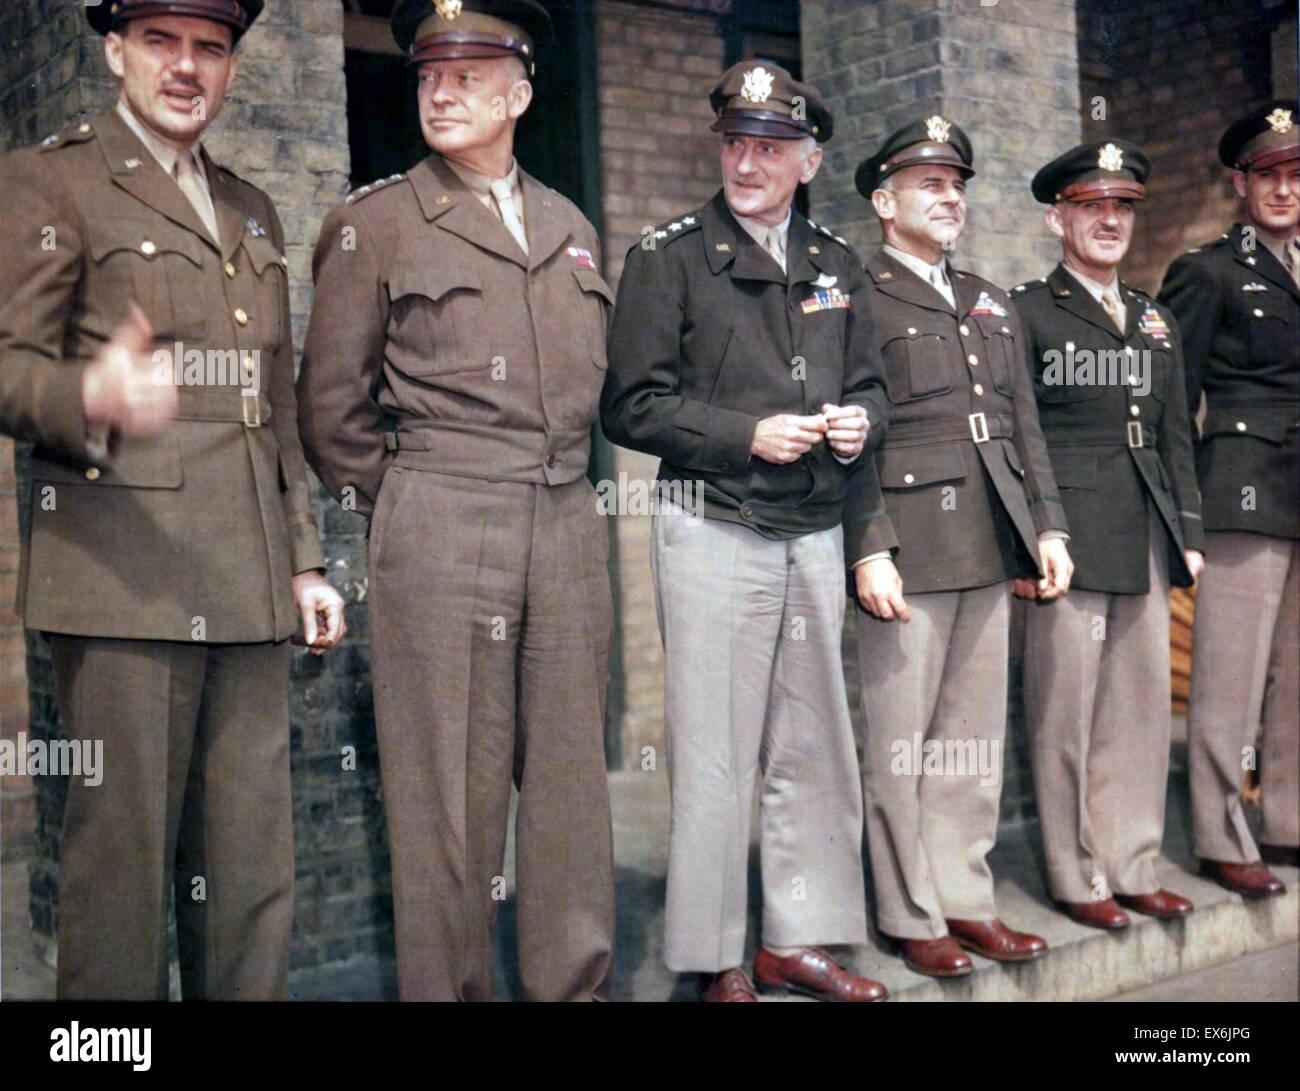 American World War Two Generals Jesse Auton, Eisenhower, Spaatz, Doolittle, Kepner and Colonel Blakeslee, 1944. - Stock Image